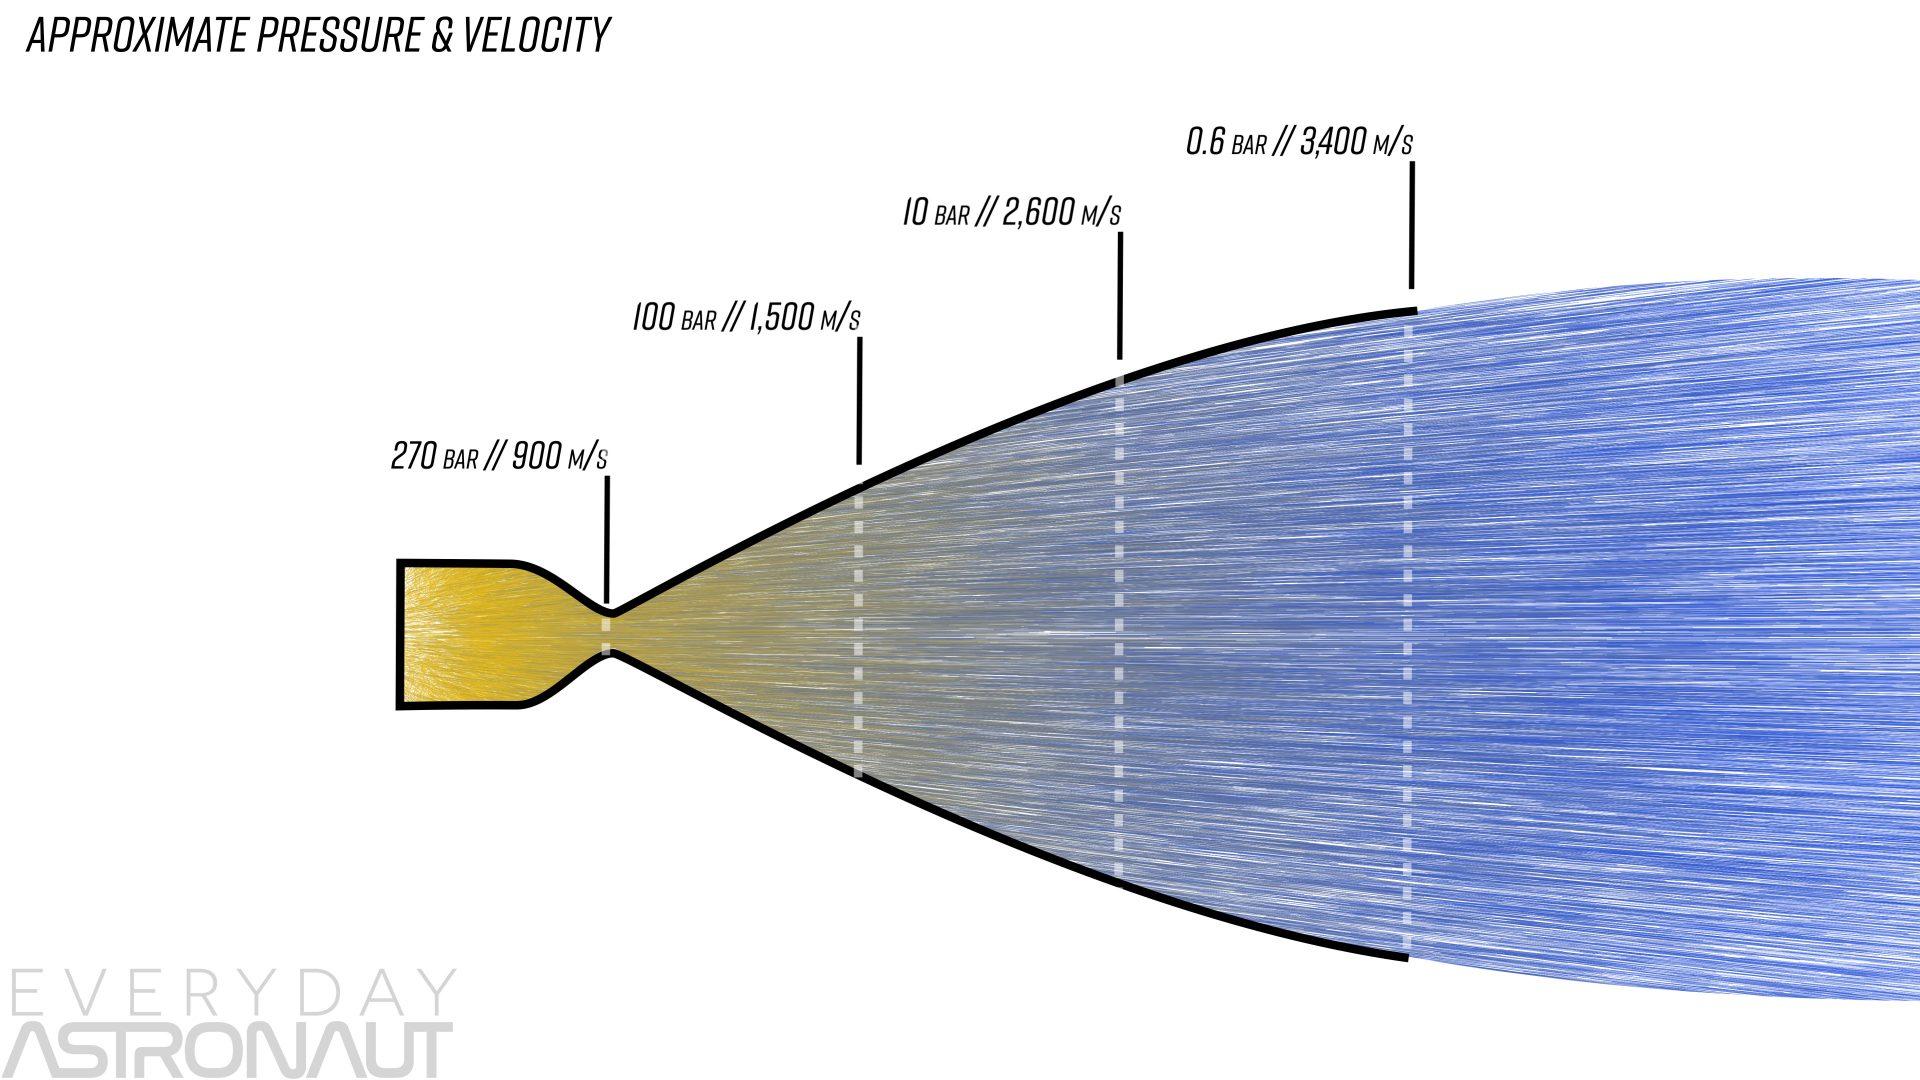 nozzle efficiency rocket engine expansion